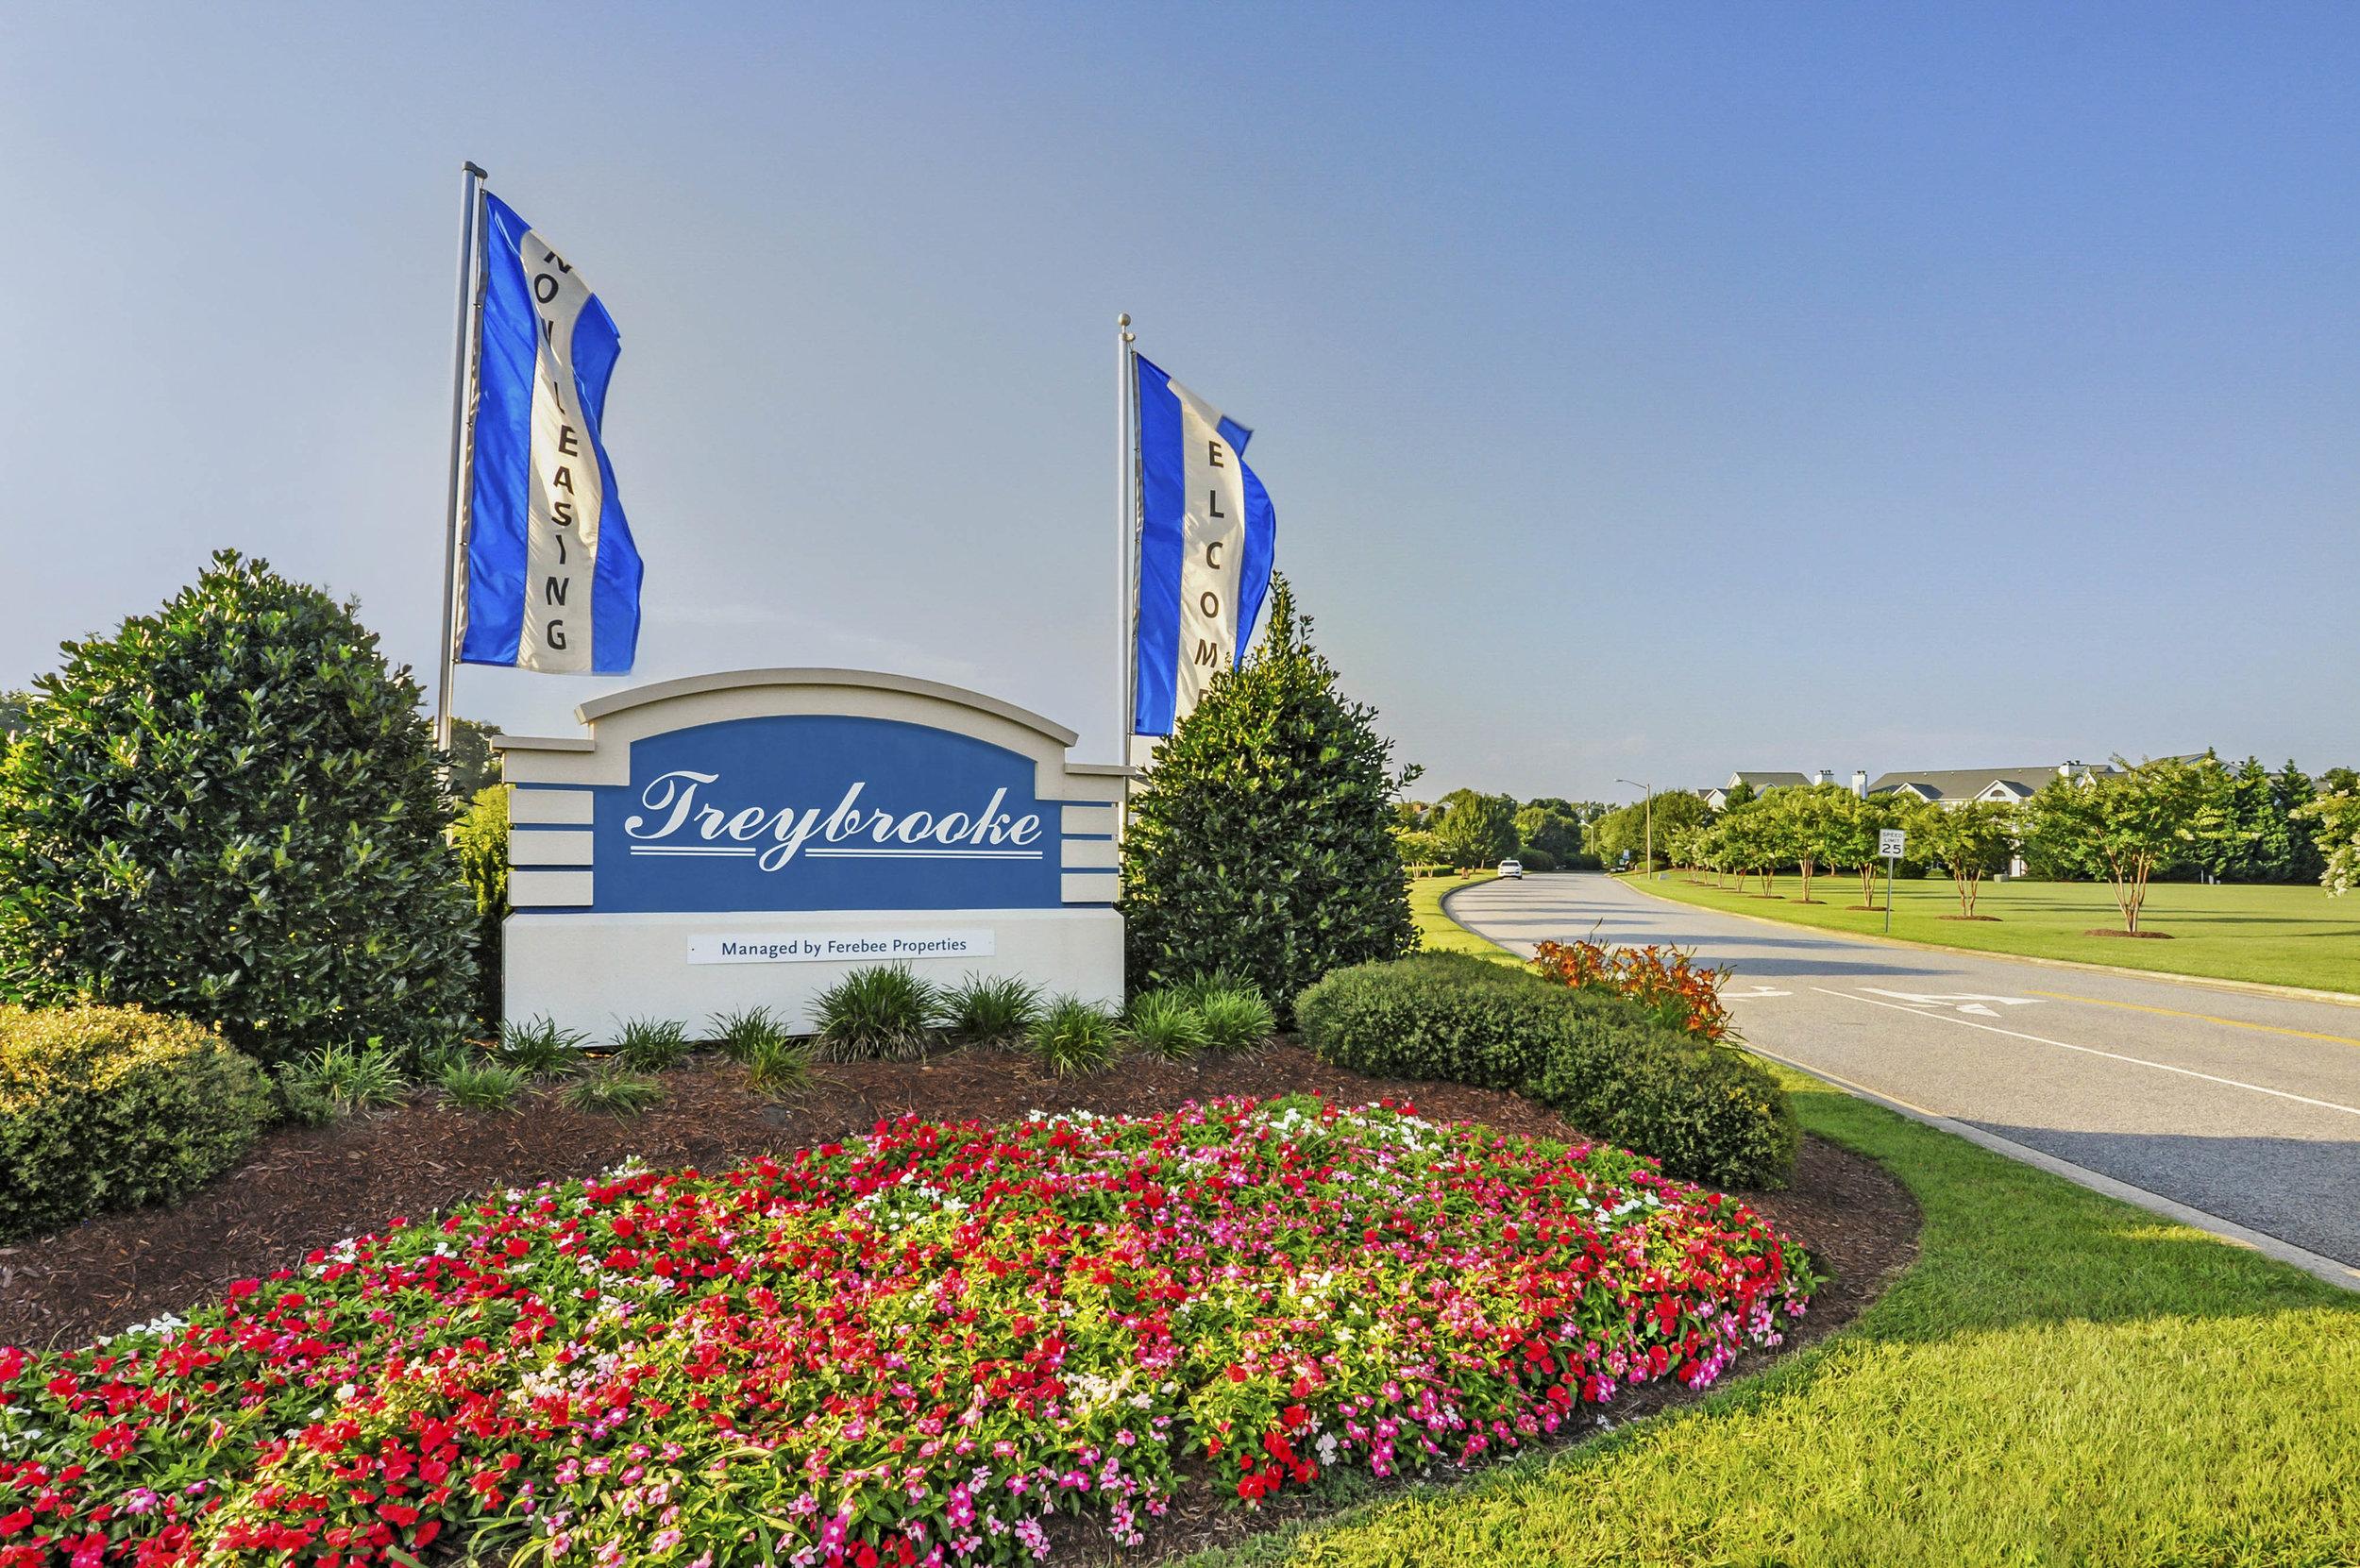 Property Sign Treybrooke Greenville NC-PH-2 2.JPG